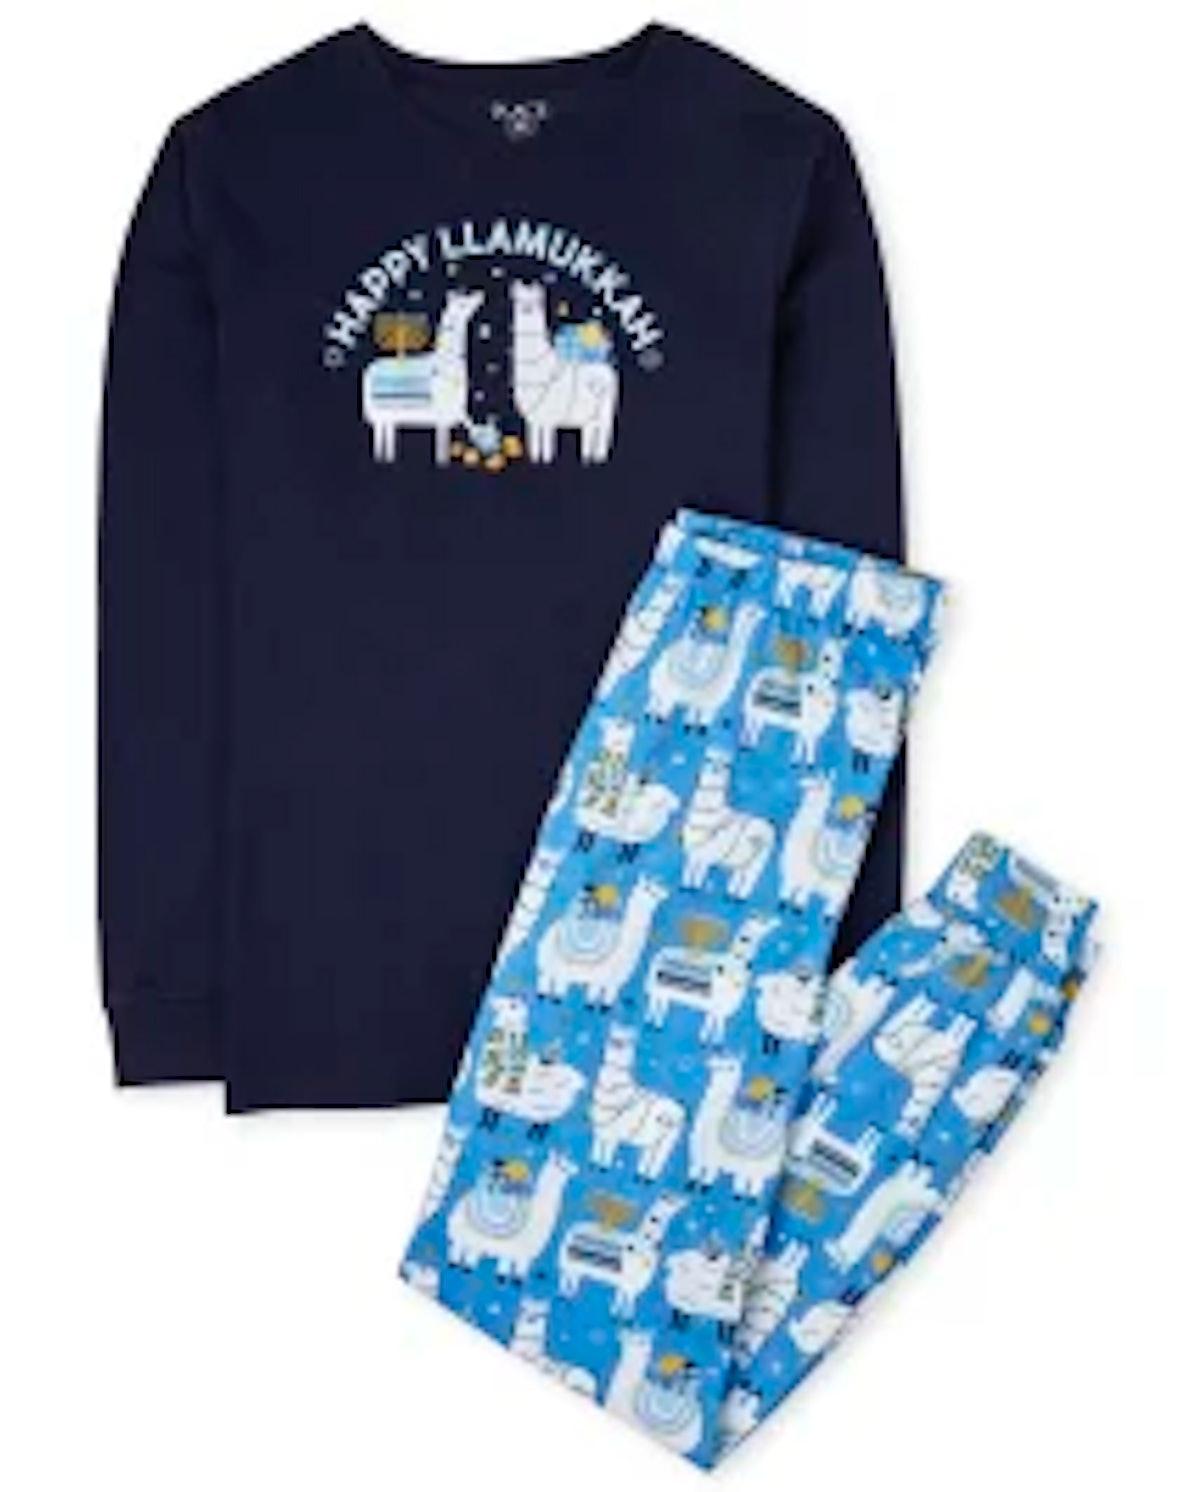 Children's Place Unisex Adult Matching Family Hanukkah Llama Cotton Pajamas